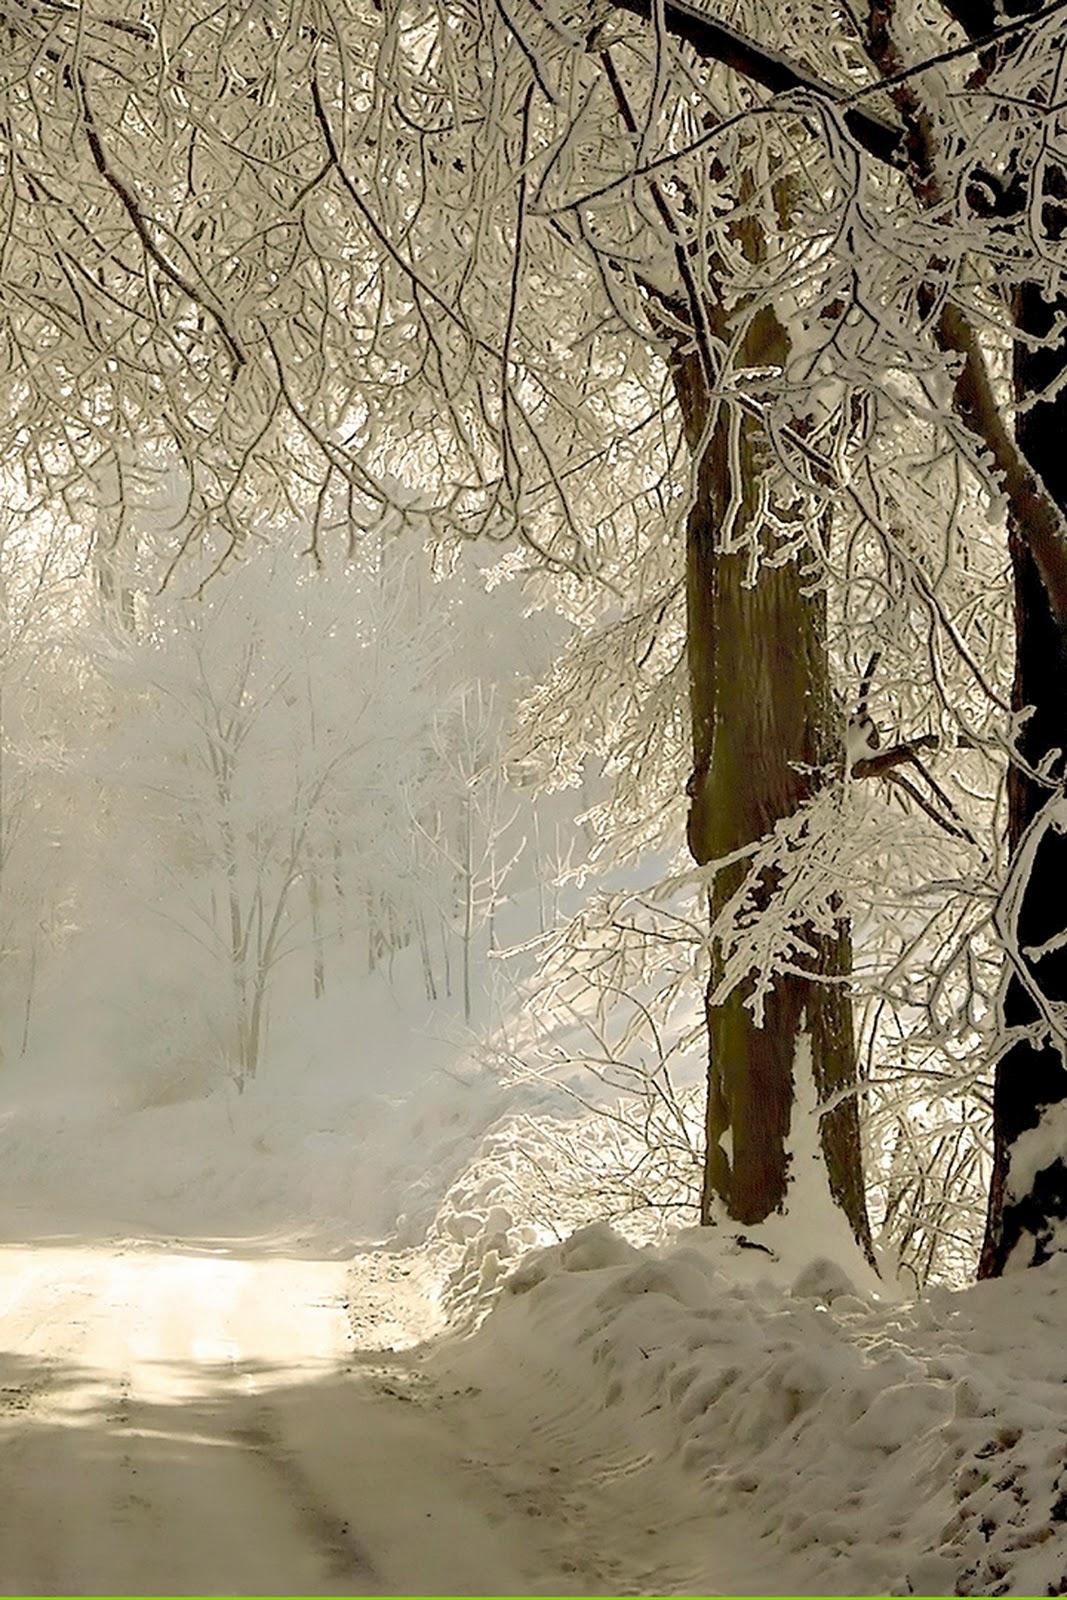 http://1.bp.blogspot.com/-iR71ElyO584/TututAaOAtI/AAAAAAAAB08/1HWG99pmo0Q/s1600/winter+road+trees_iphone+_new+years+eve_wallpaper.jpg